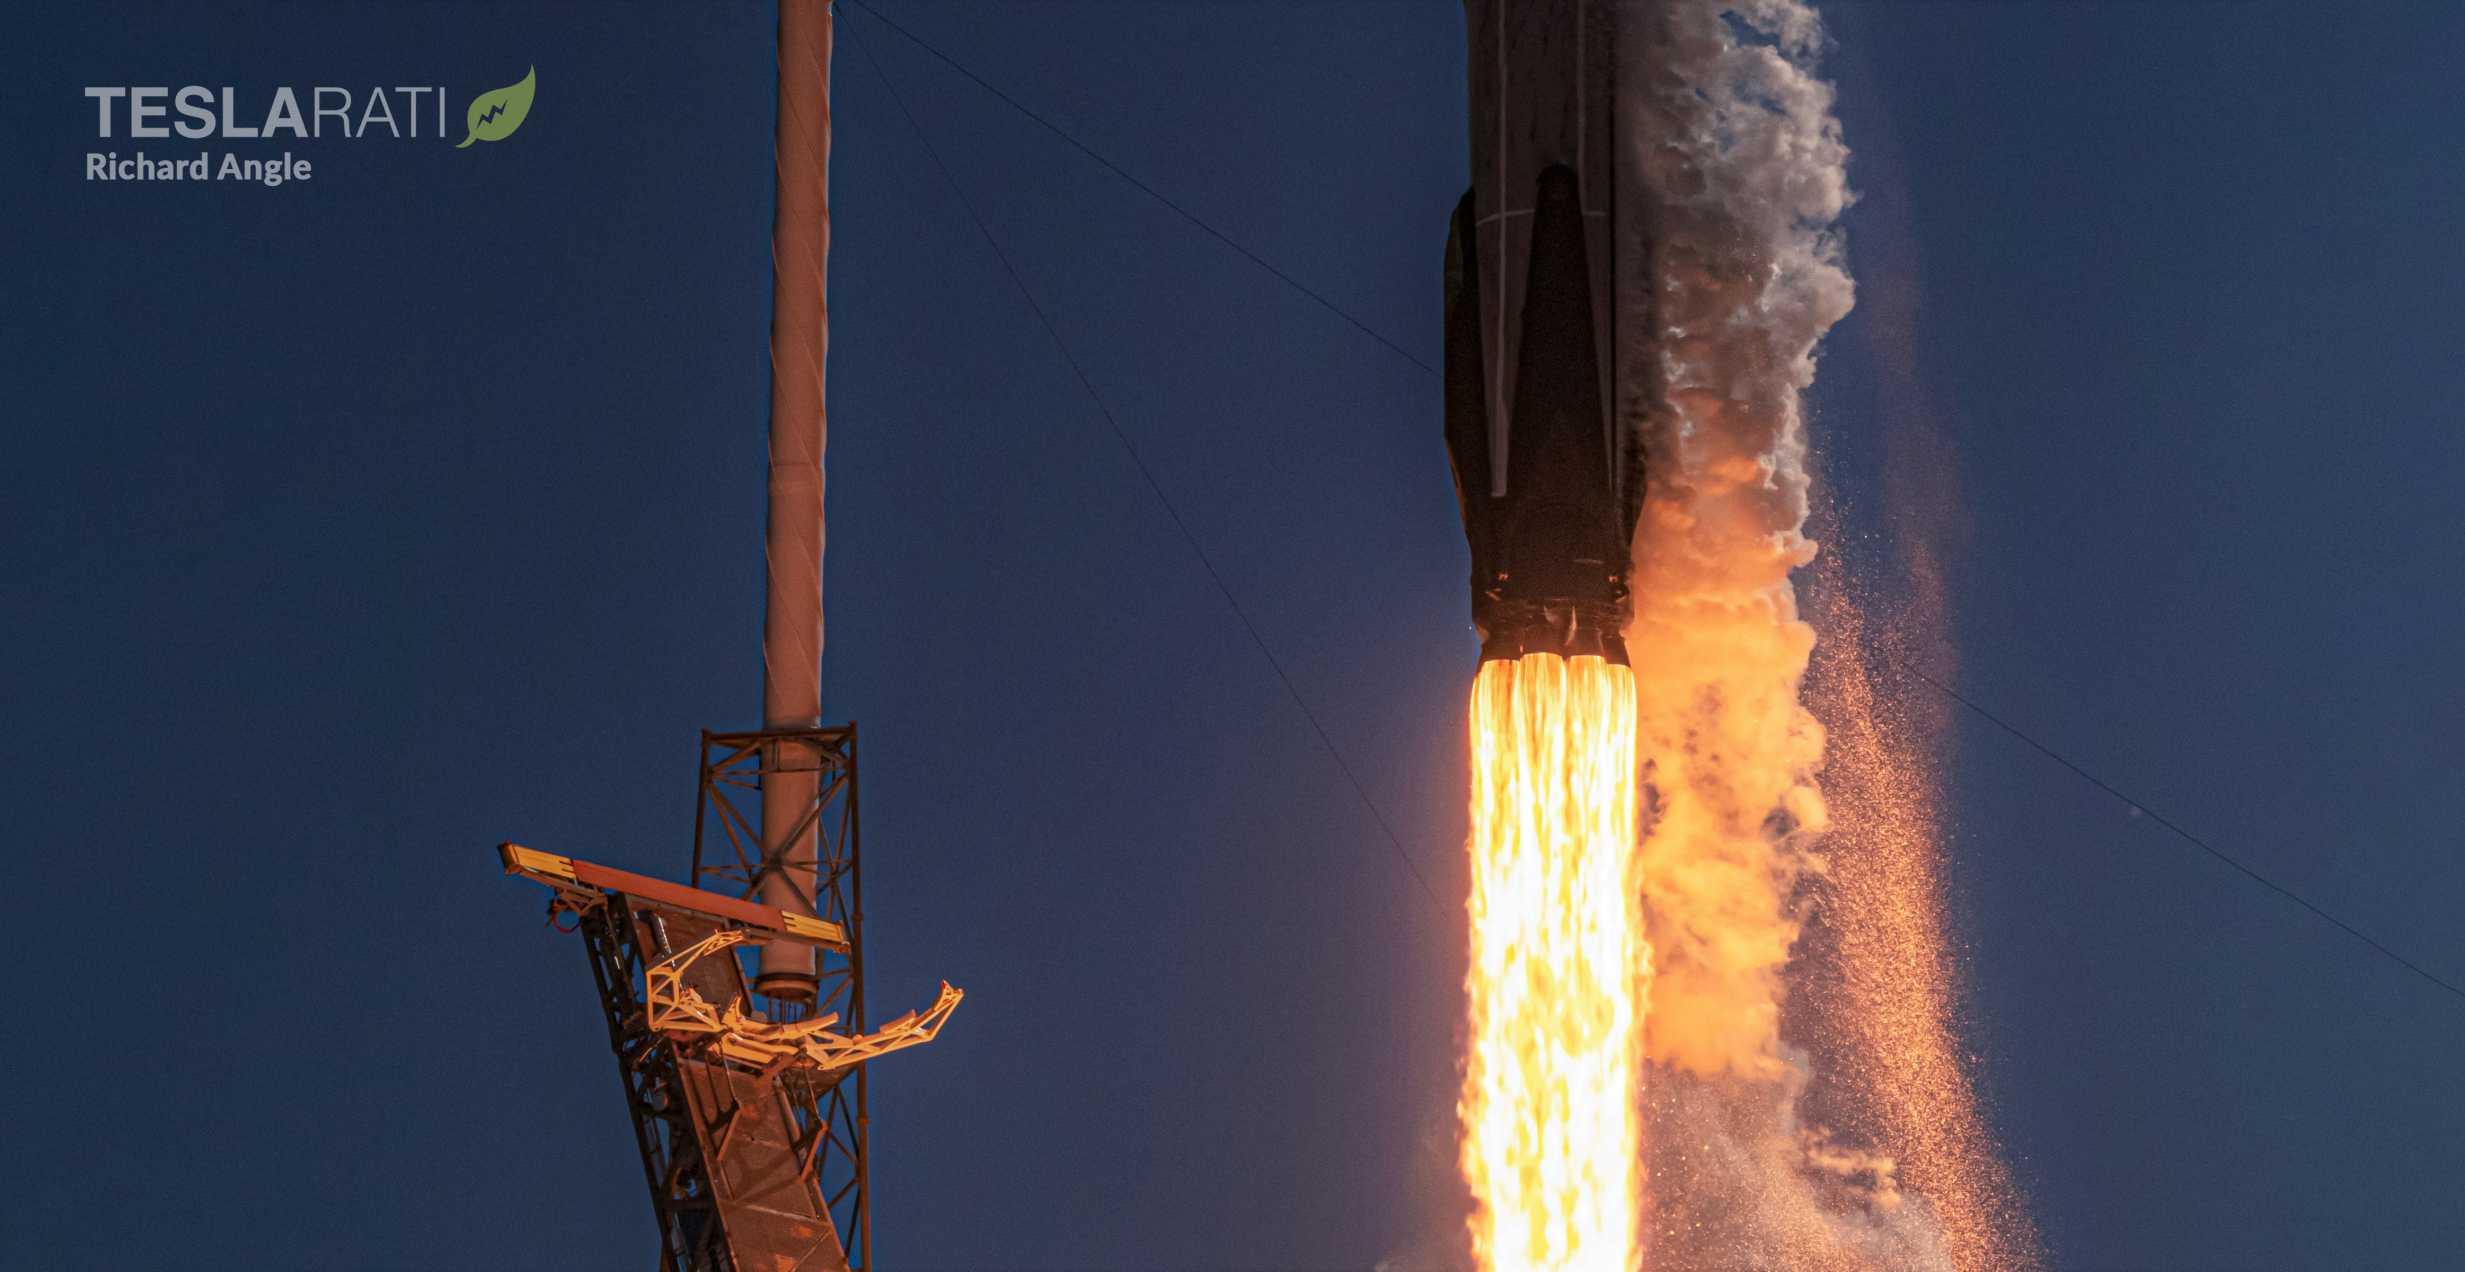 ANASIS II Falcon 9 B1058 072020 (Richard Angle) launch 6 crop 1 (c)